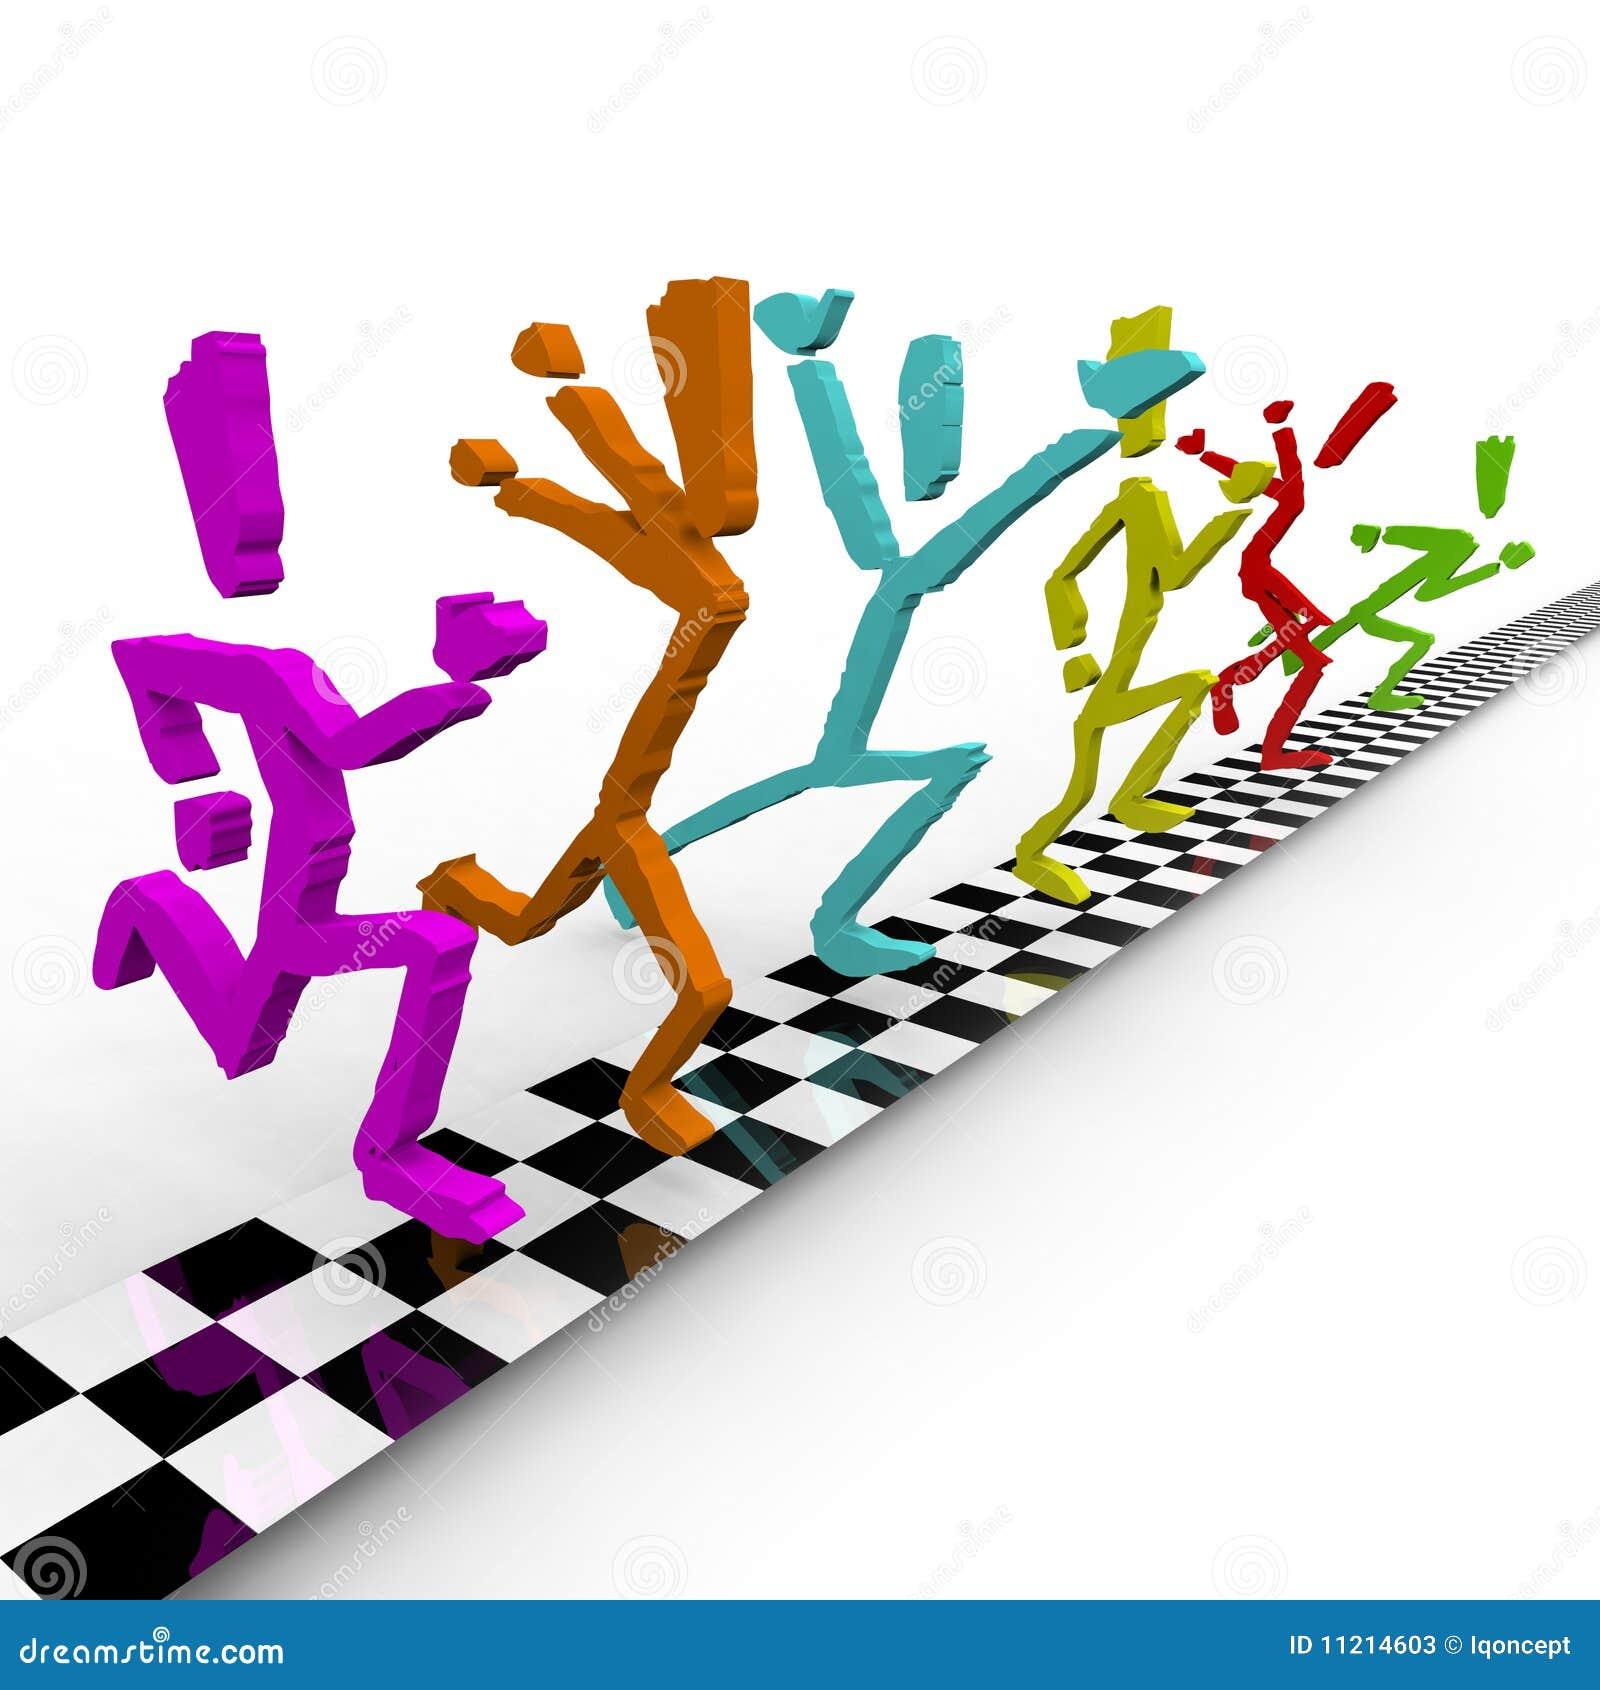 http://thumbs.dreamstime.com/z/final-de-la-foto-meta-cruzada-de-los-corredores-junto-11214603.jpg